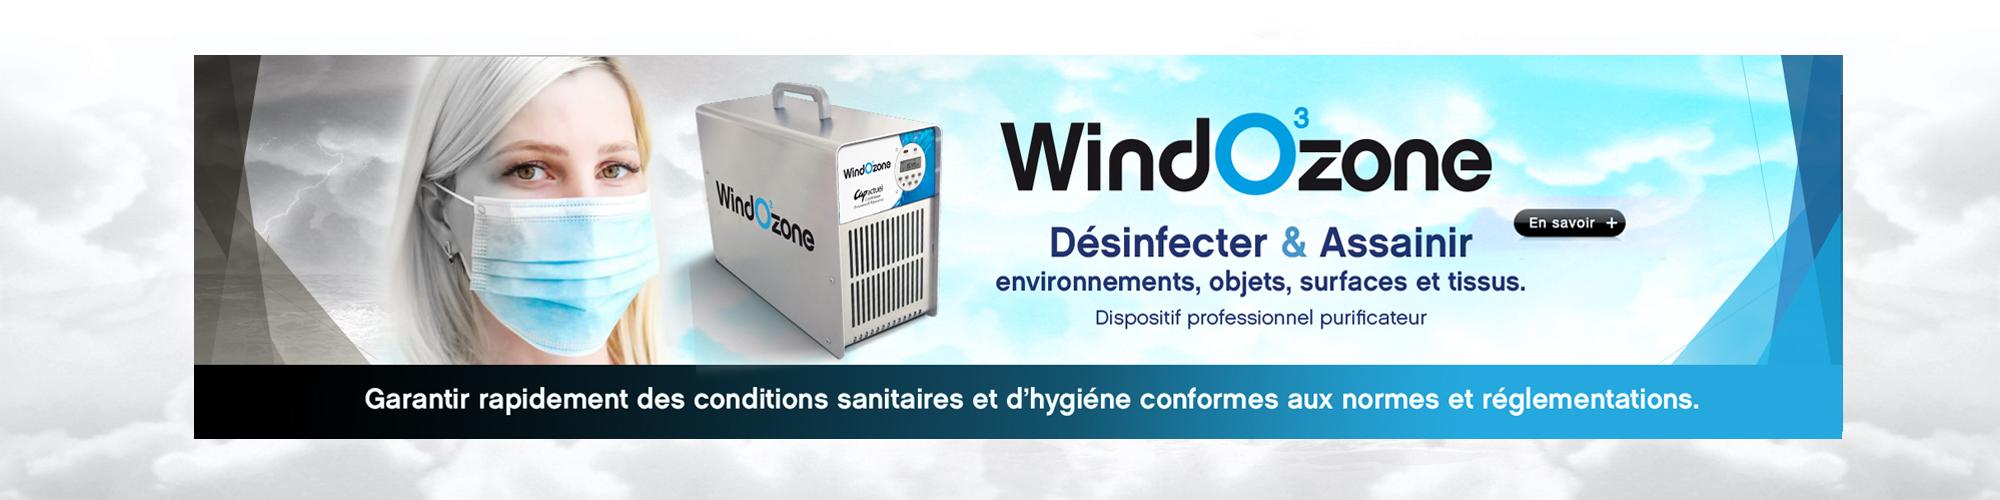 https://www.capactuel.com/storage/app/media/Carousel/accueil/windozone2.jpg